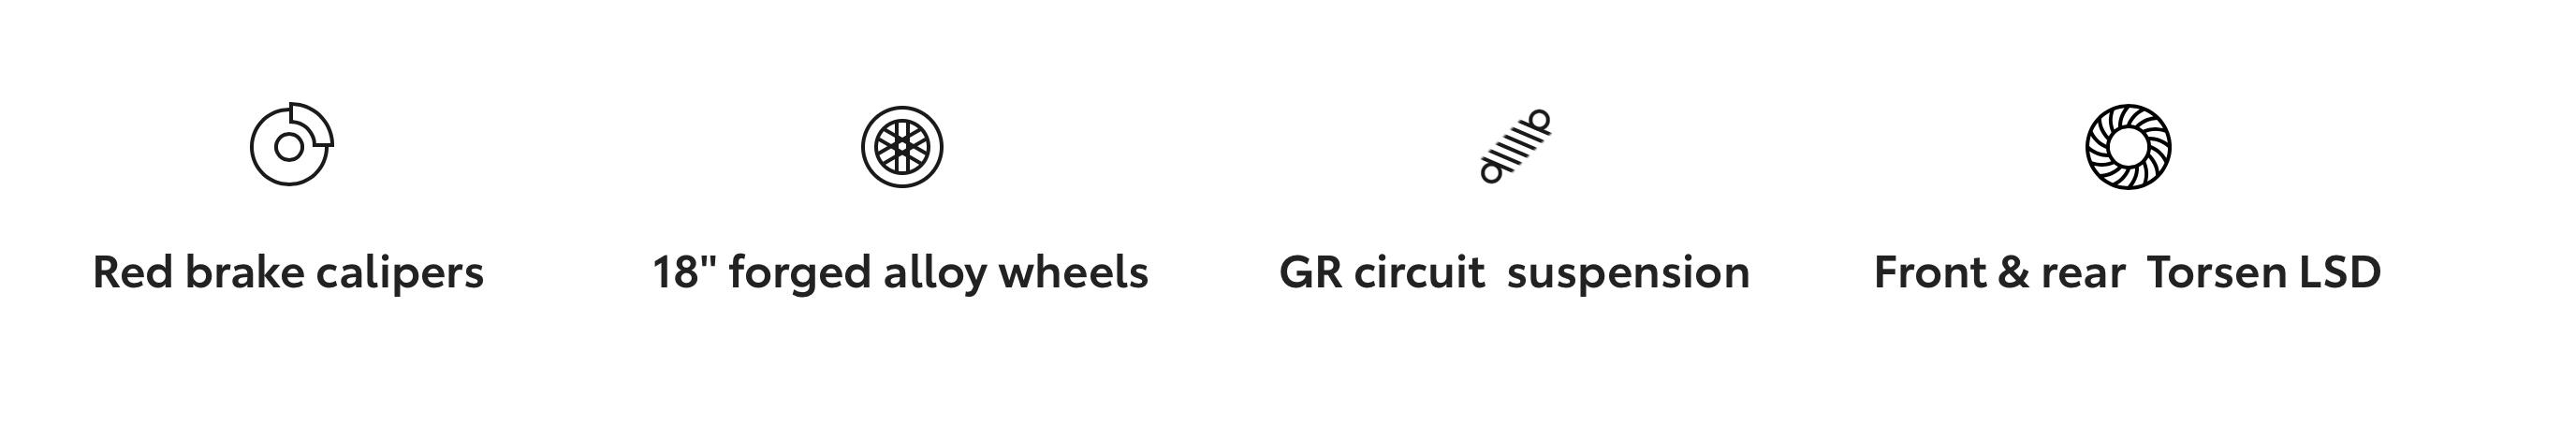 GR Yaris Rallye Edition - launching in 2021 at Sunshine Toyota!